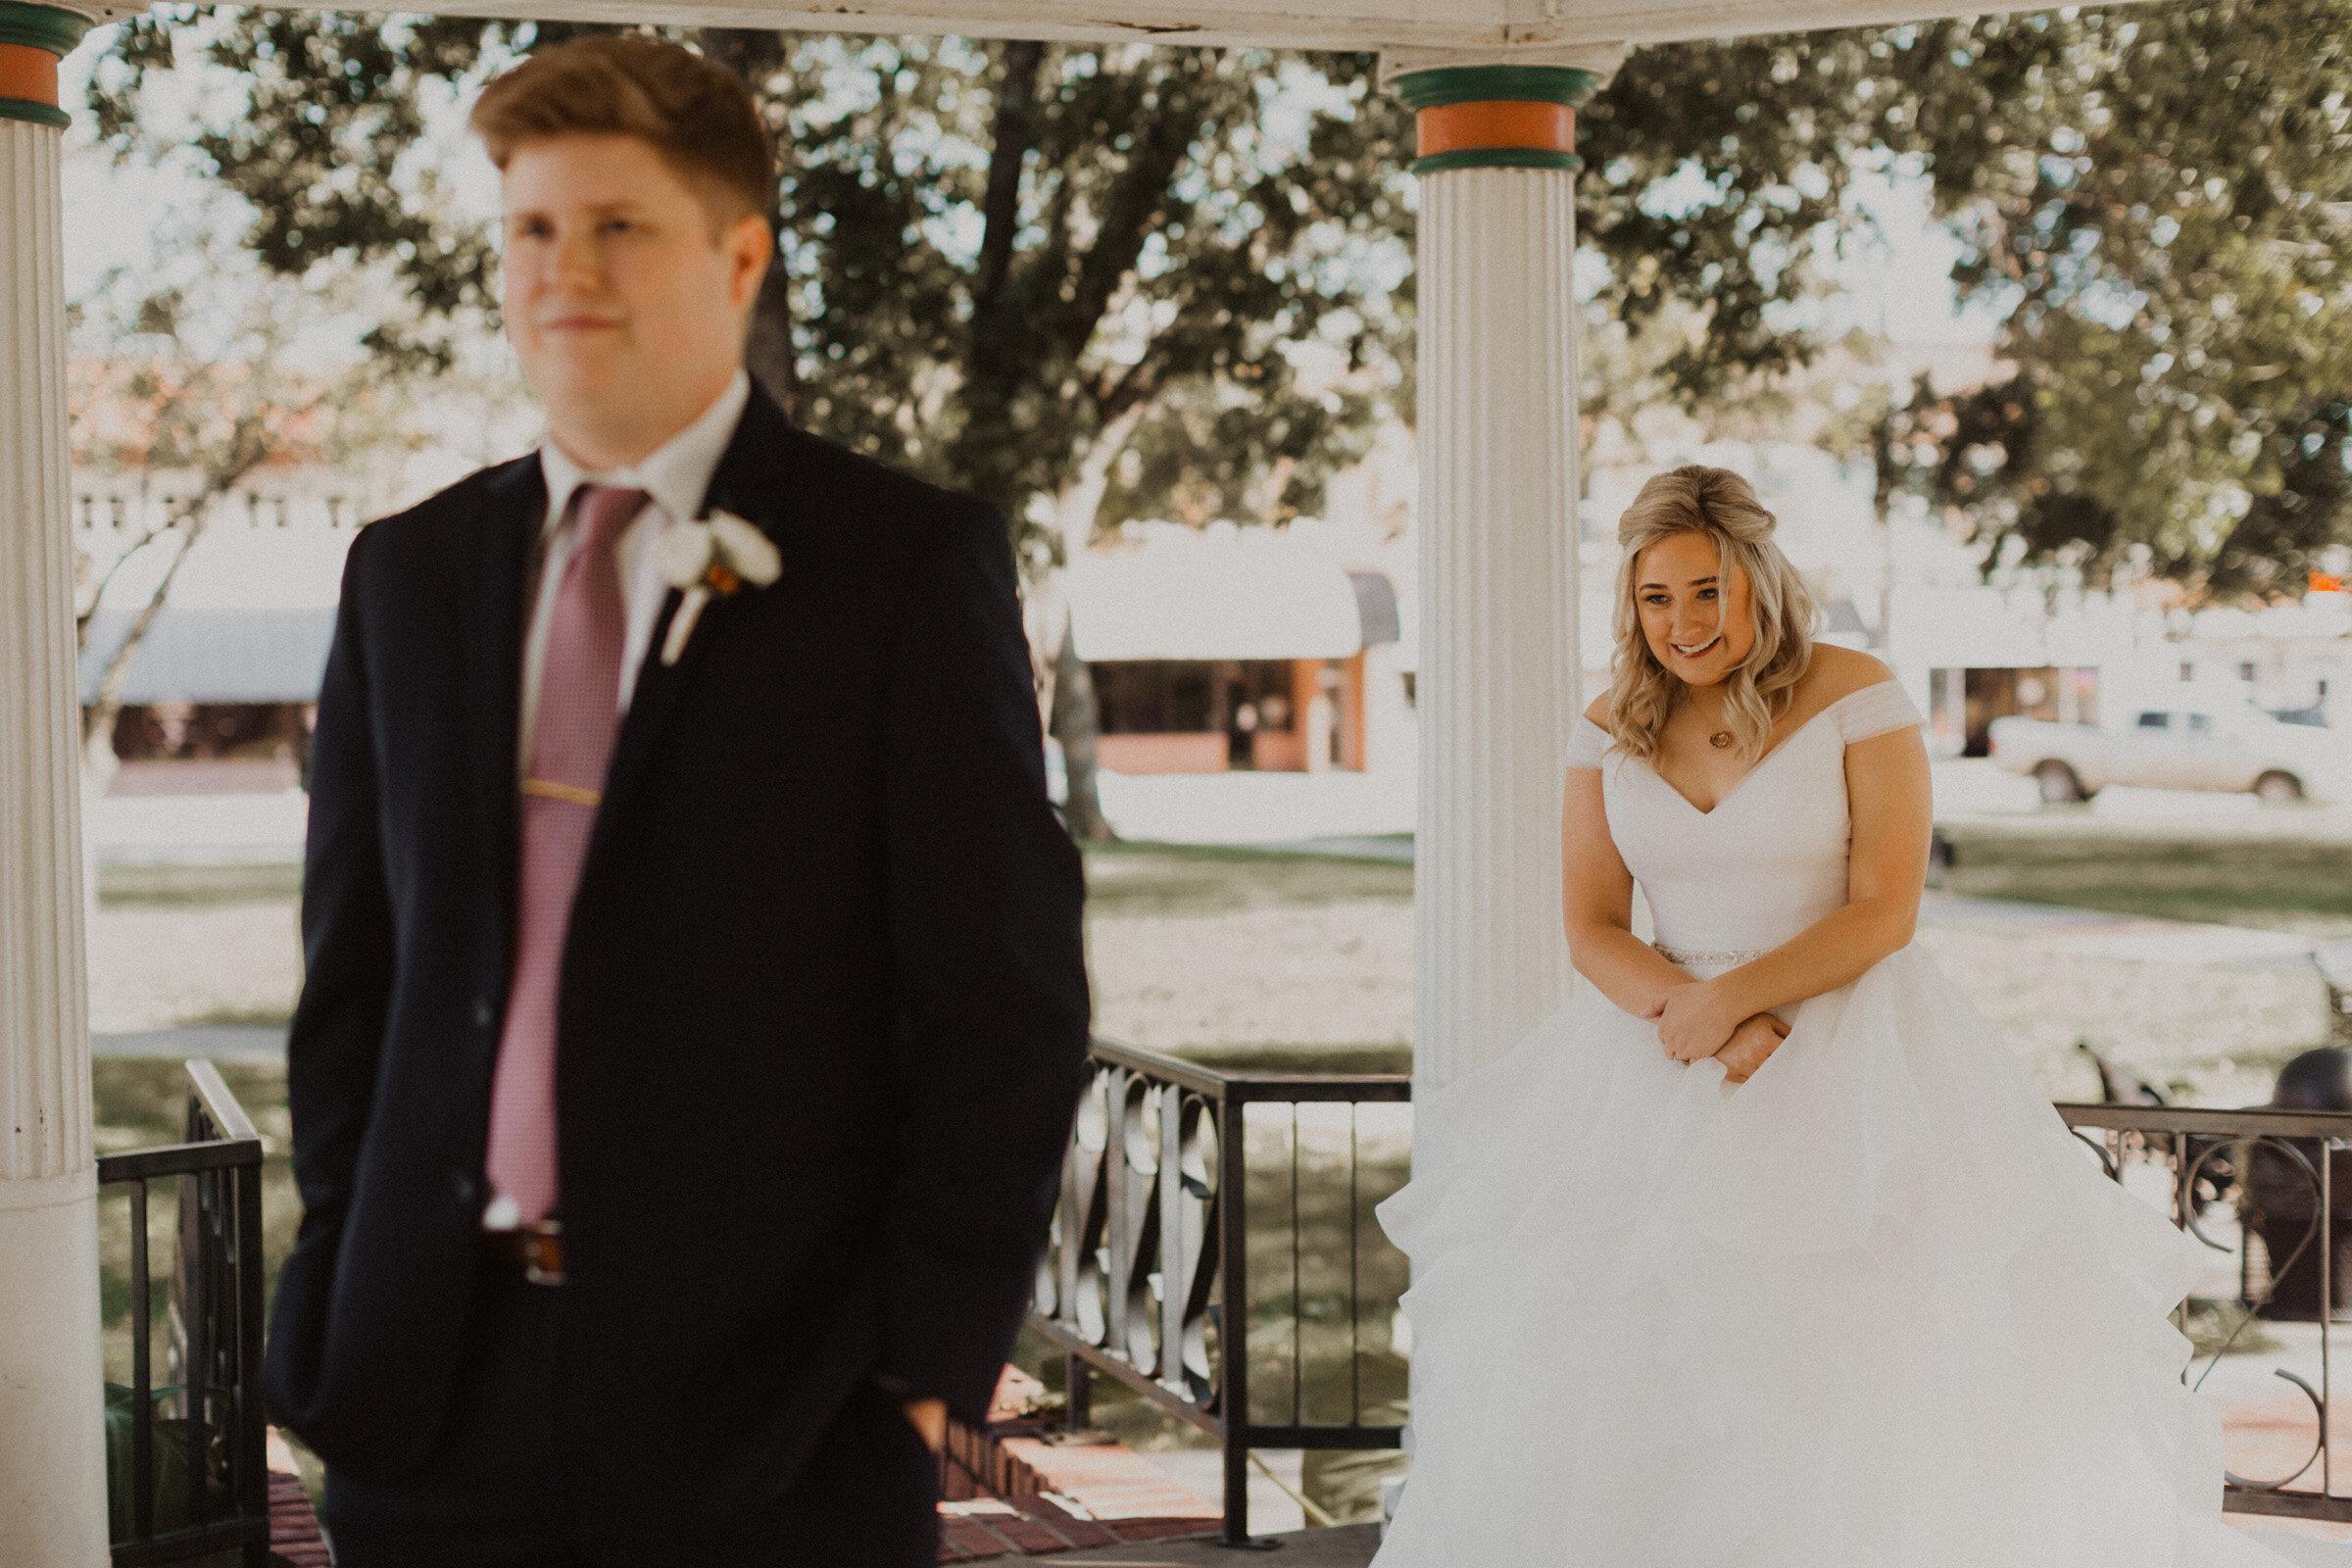 alyssa barletter photography town square paola wedding-8.jpg